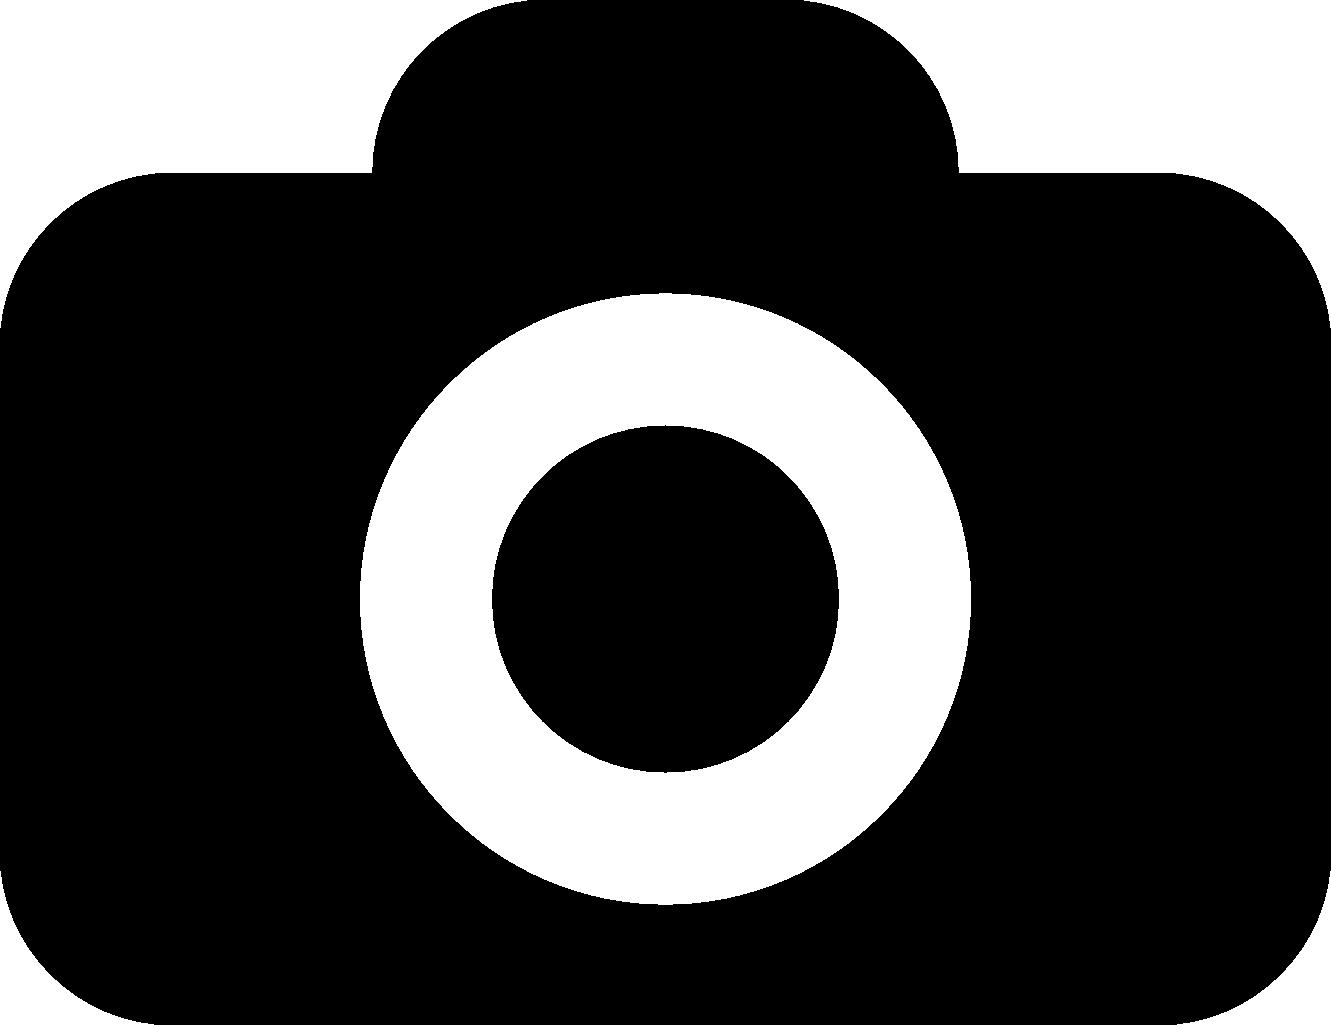 Camera clipart Camera And White Clipart Black